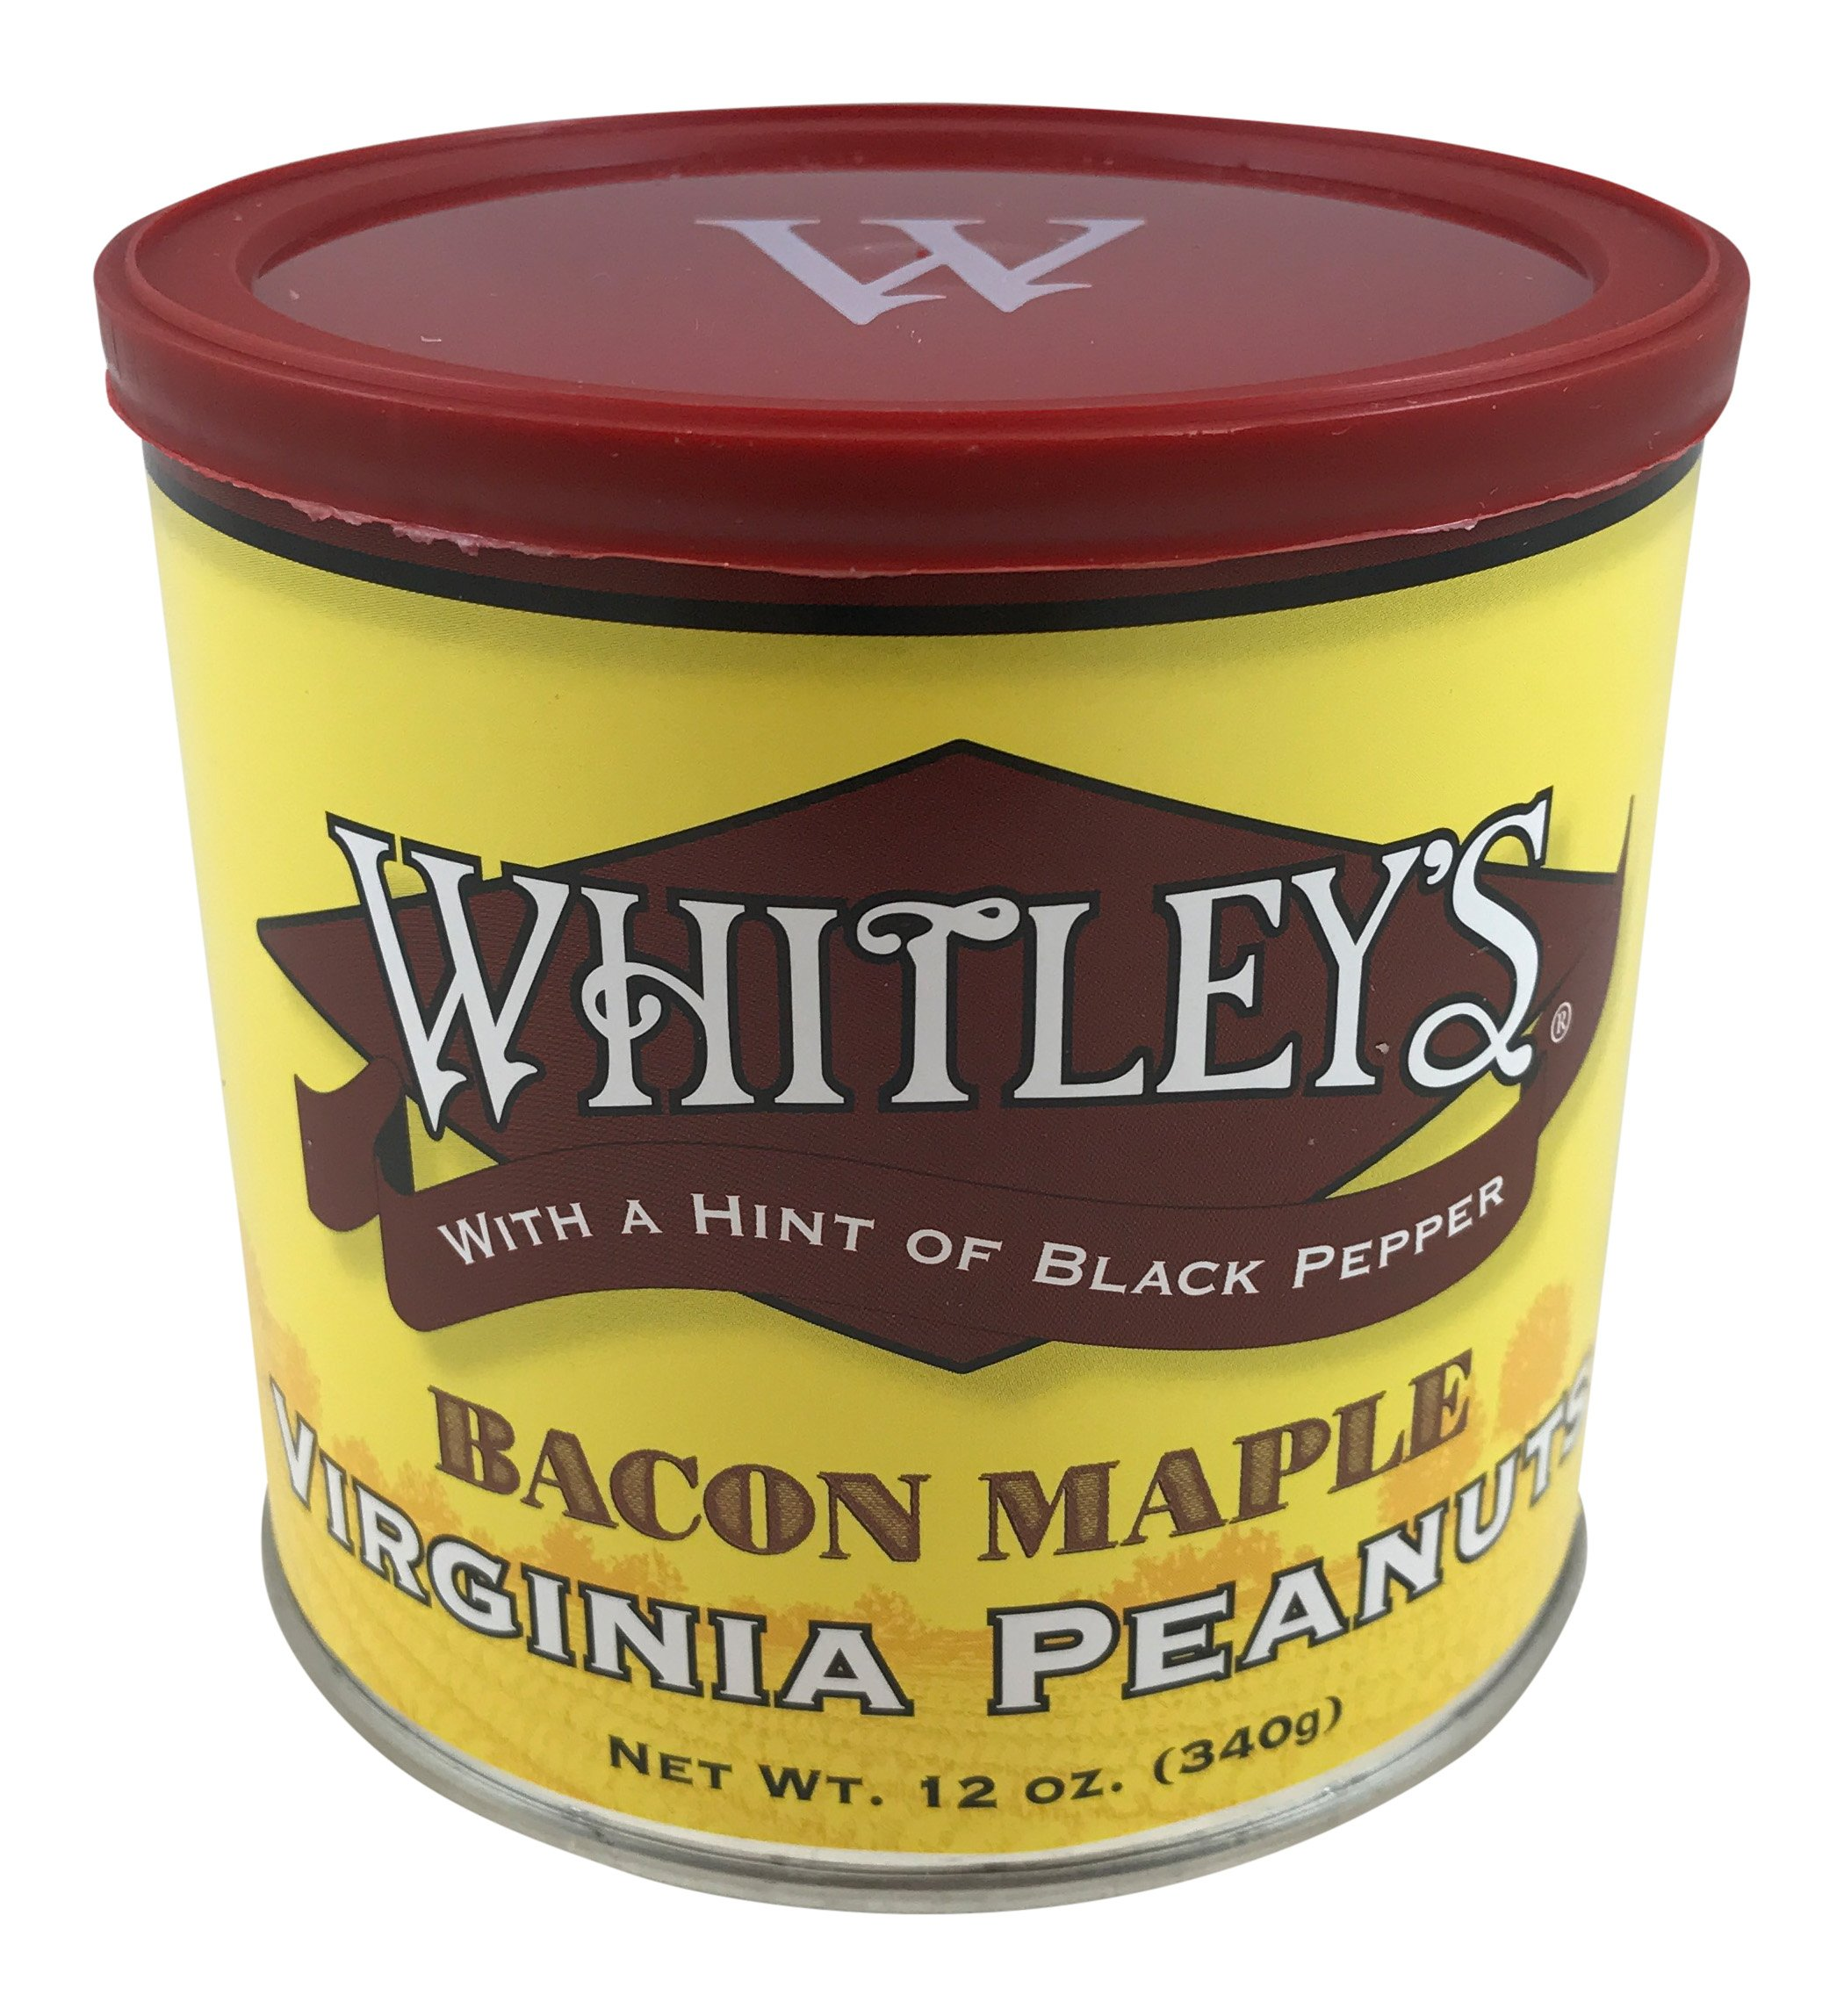 Whitley's Bacon Maple Virginia Peanuts 12 Oz Tin